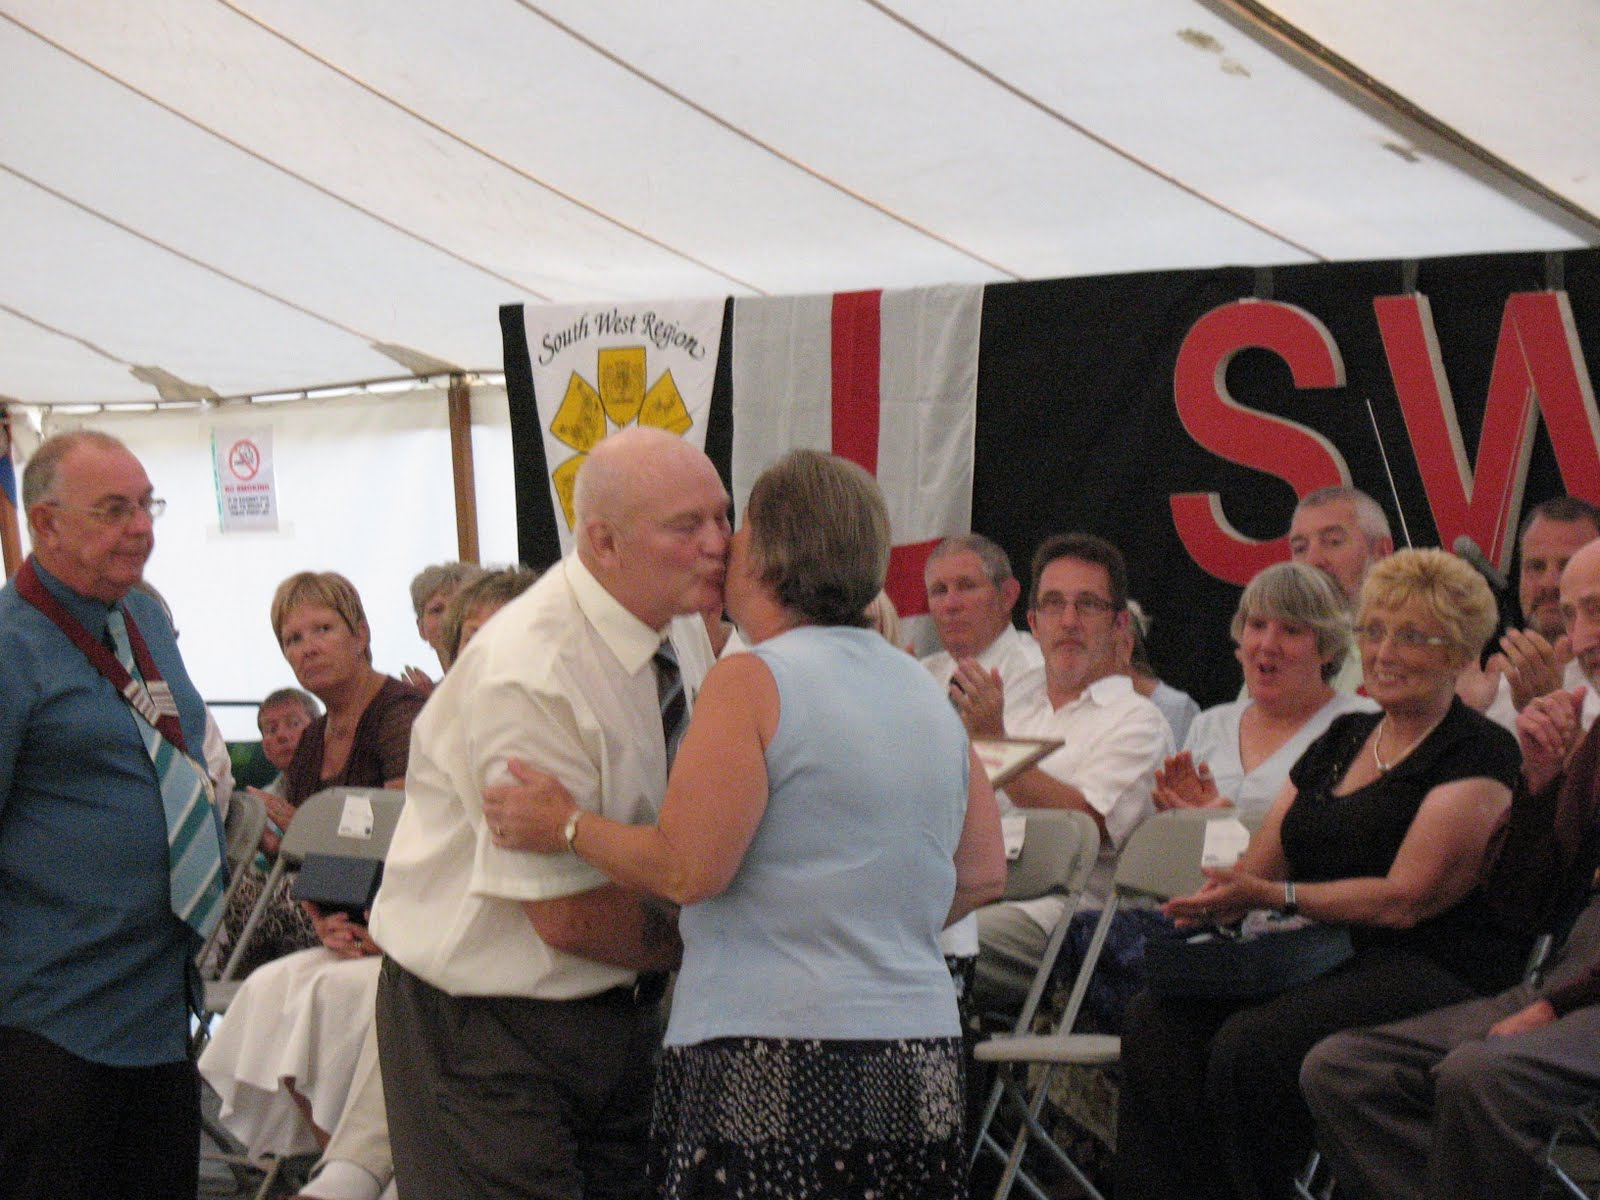 SWR - July 2010